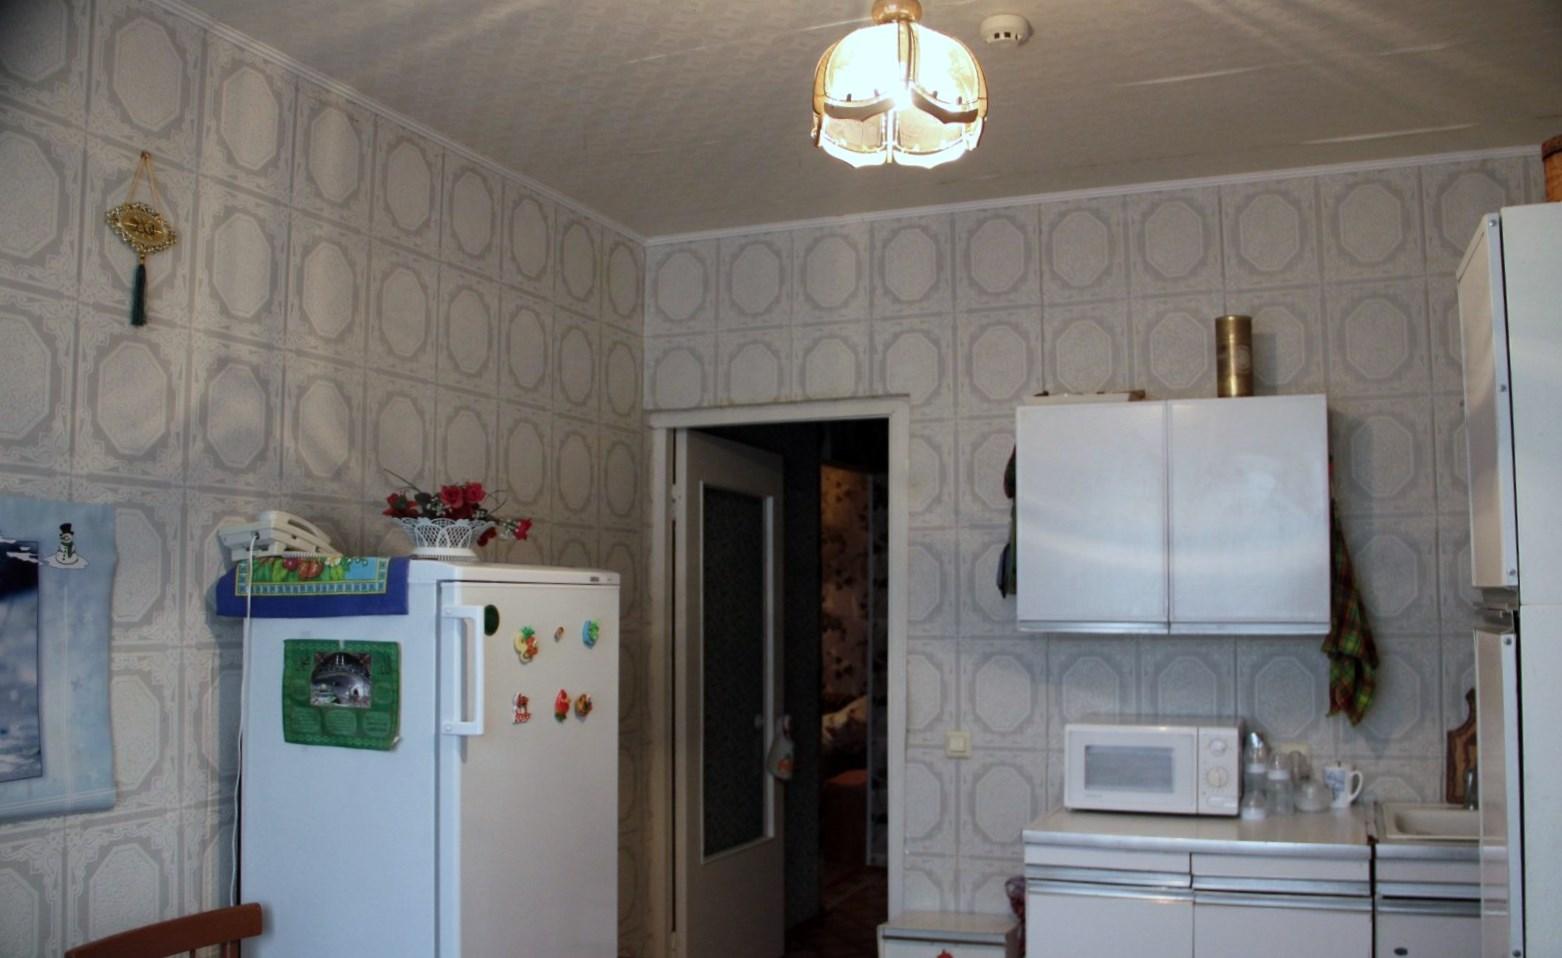 продается 2-х комнатная квартира в Сипайлово 69 м2